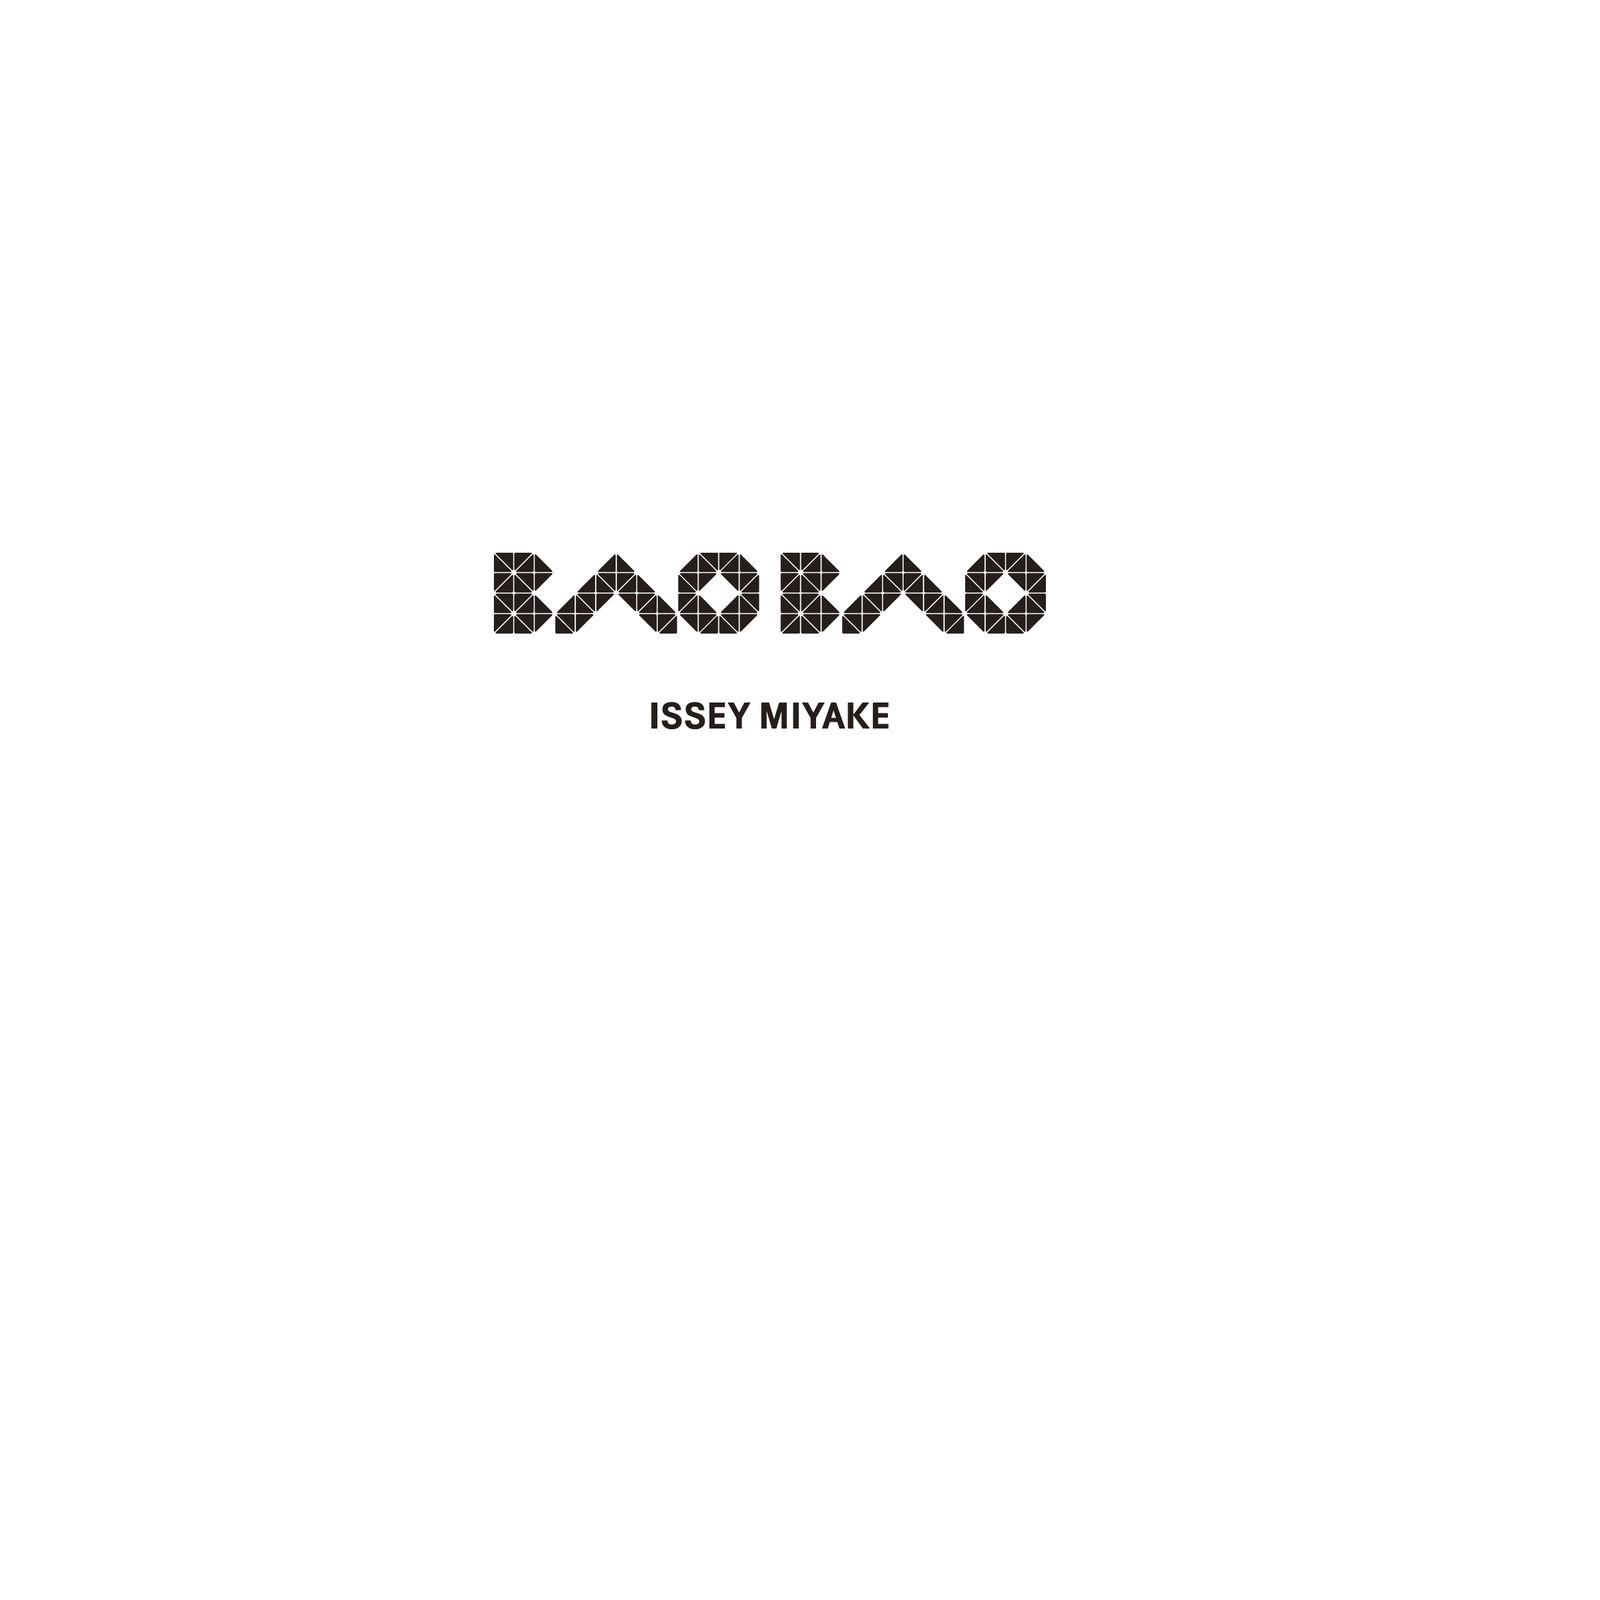 BAO BAO ISSEY MIYAKE (Bild 1)